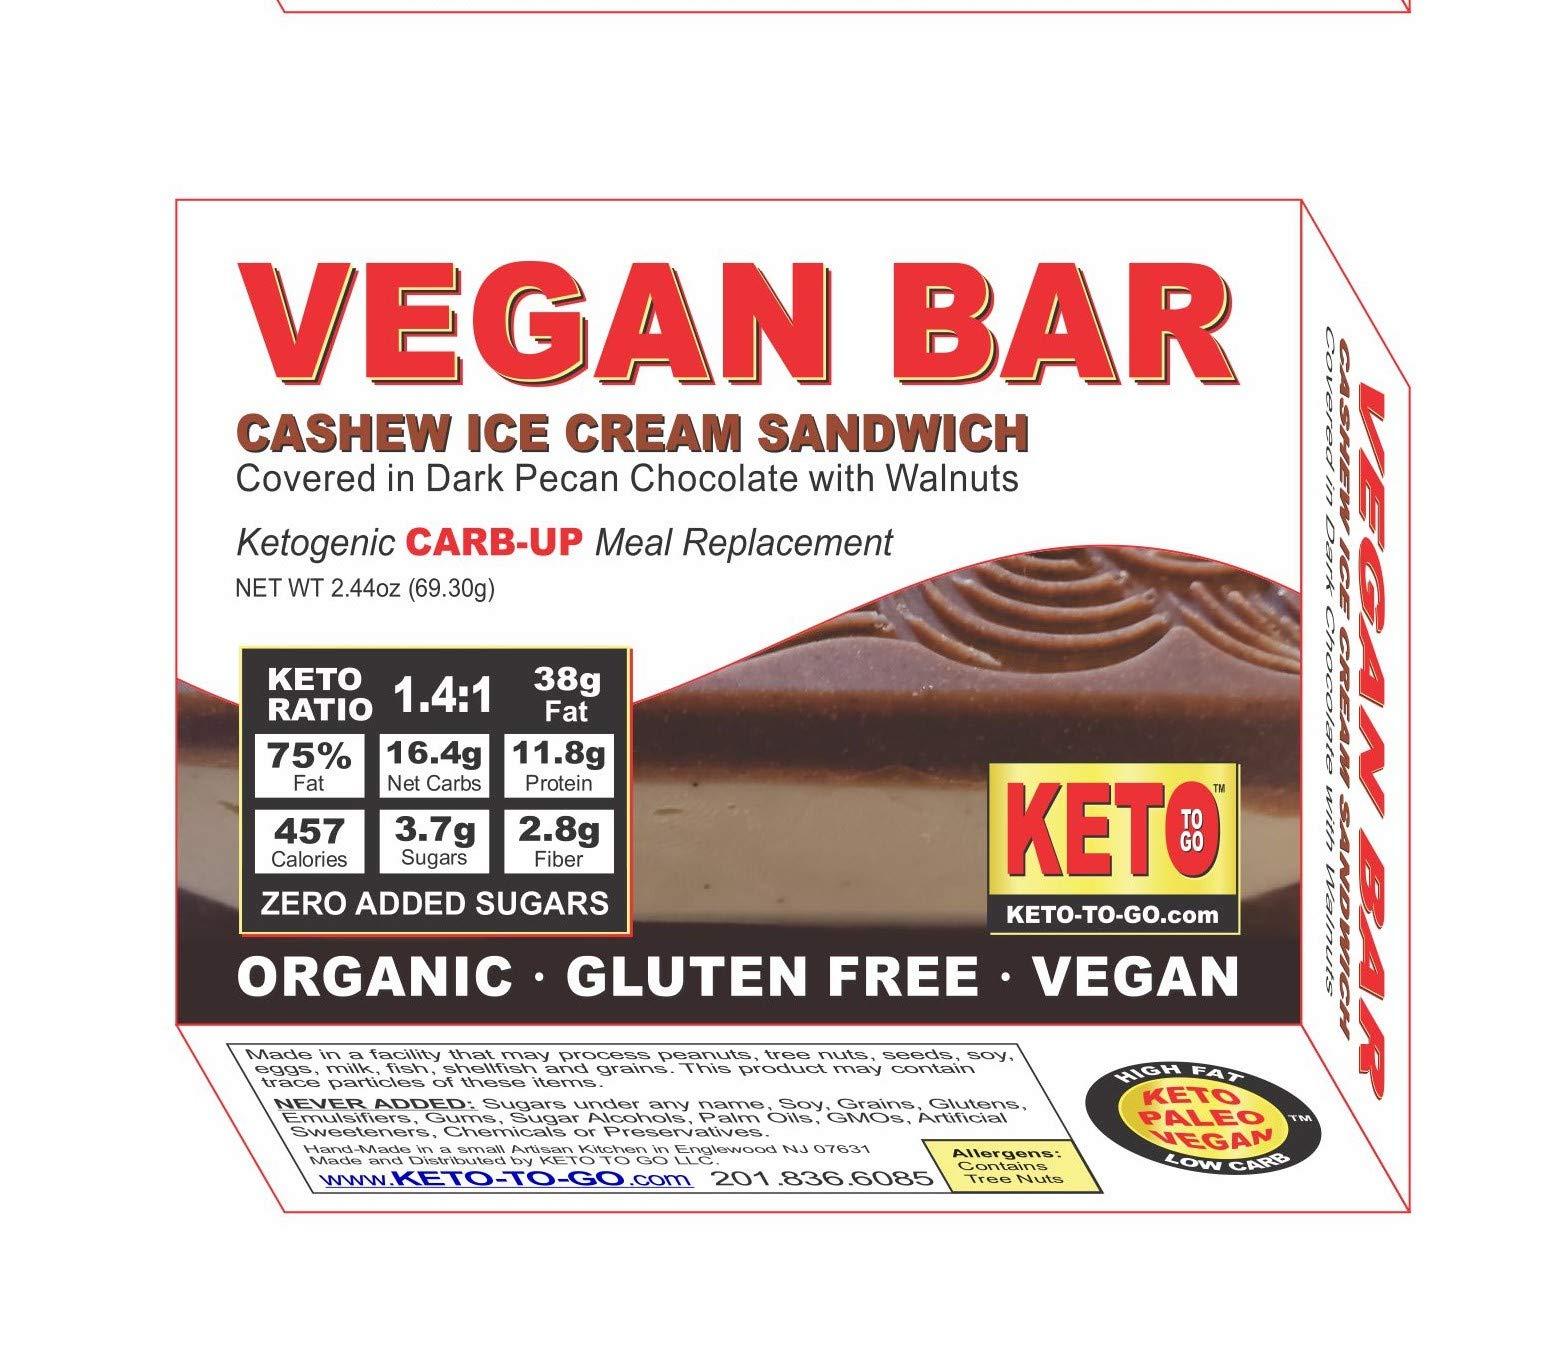 Vegan BAR - Cashew Vanilla Ice Cream Sandwich - Organic, Raw, Low Carb, Sugar Free, Gluten Free, Dairy Free, Soy Free, Vegan! 3-Pak by KETO TO GO